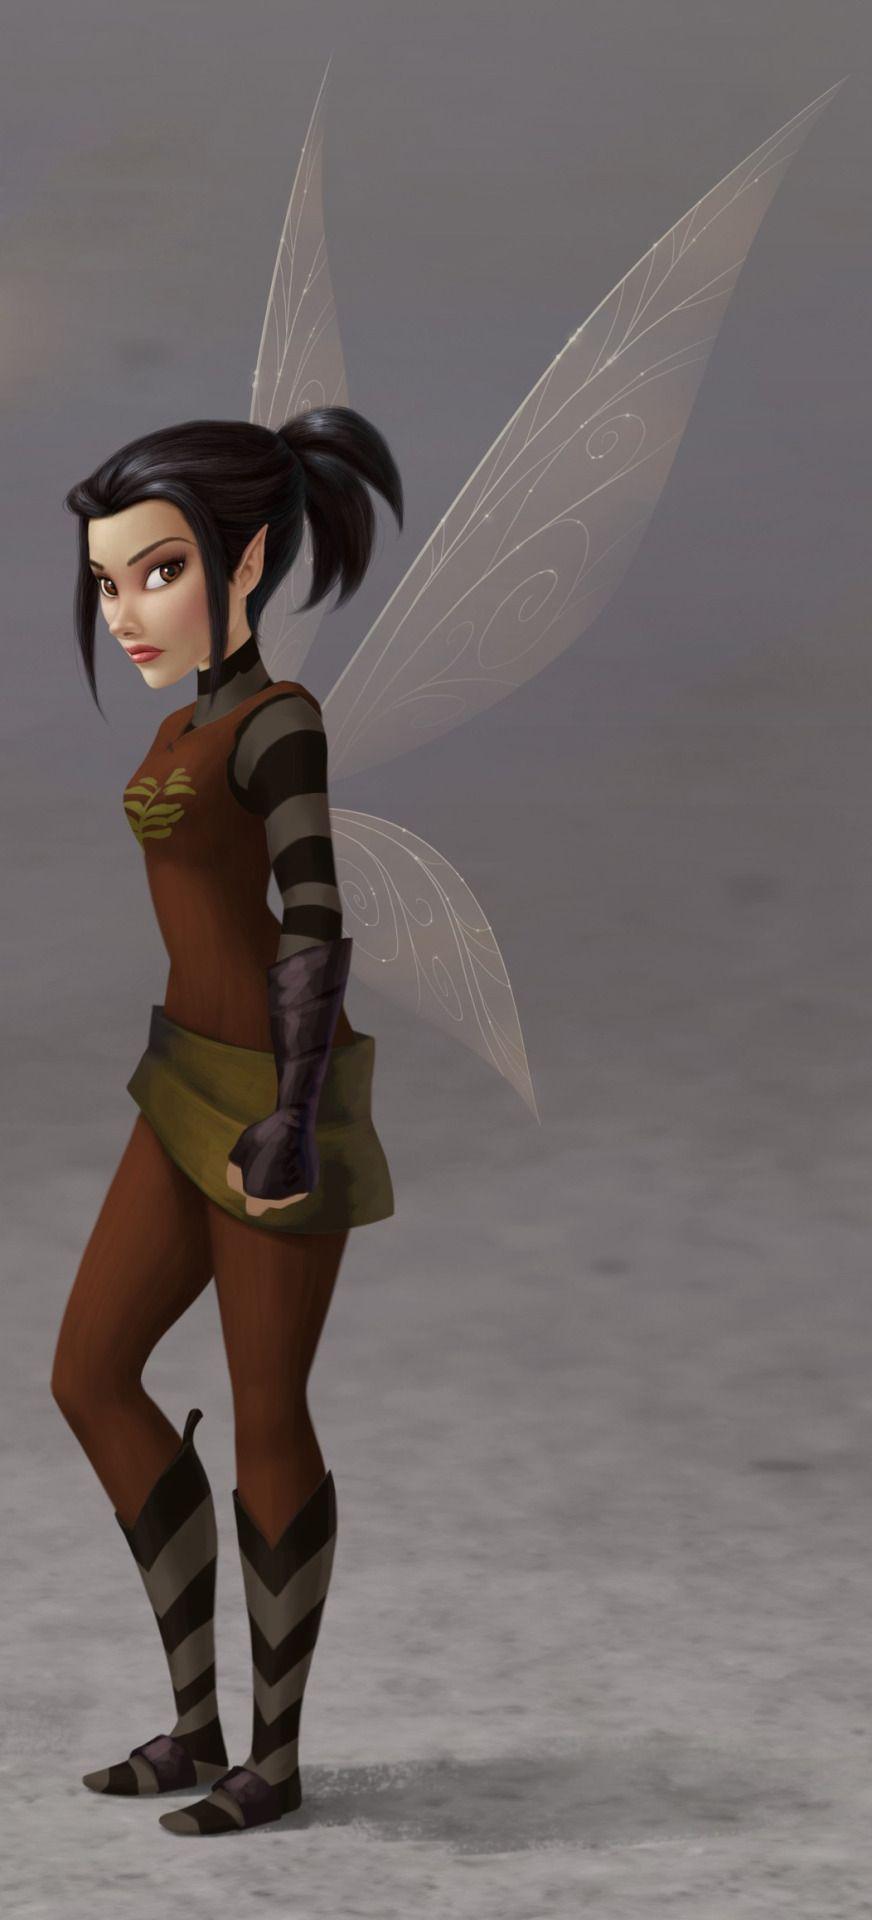 tinkerbell meet the fairies at pixie